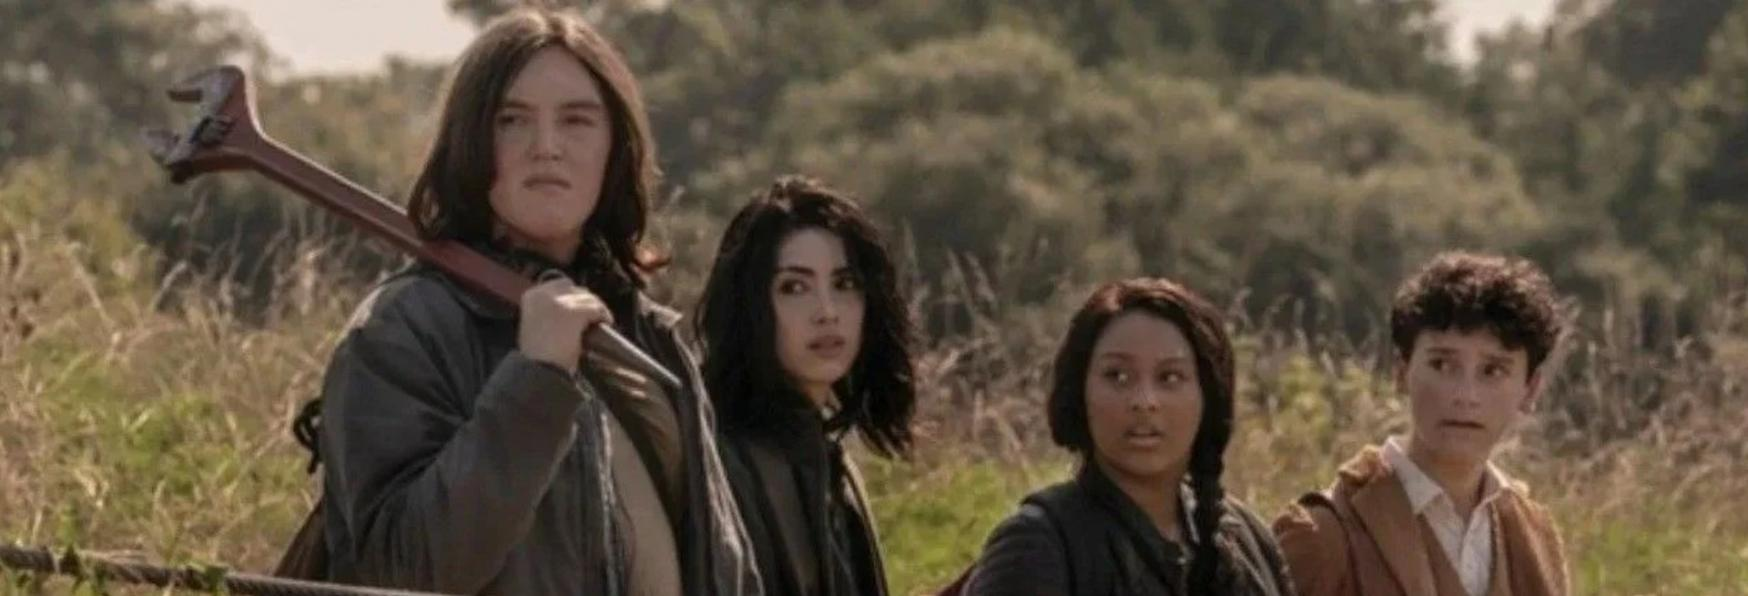 The Walking Dead: World Beyond 2 - Le Ultime Aggiunte al Cast